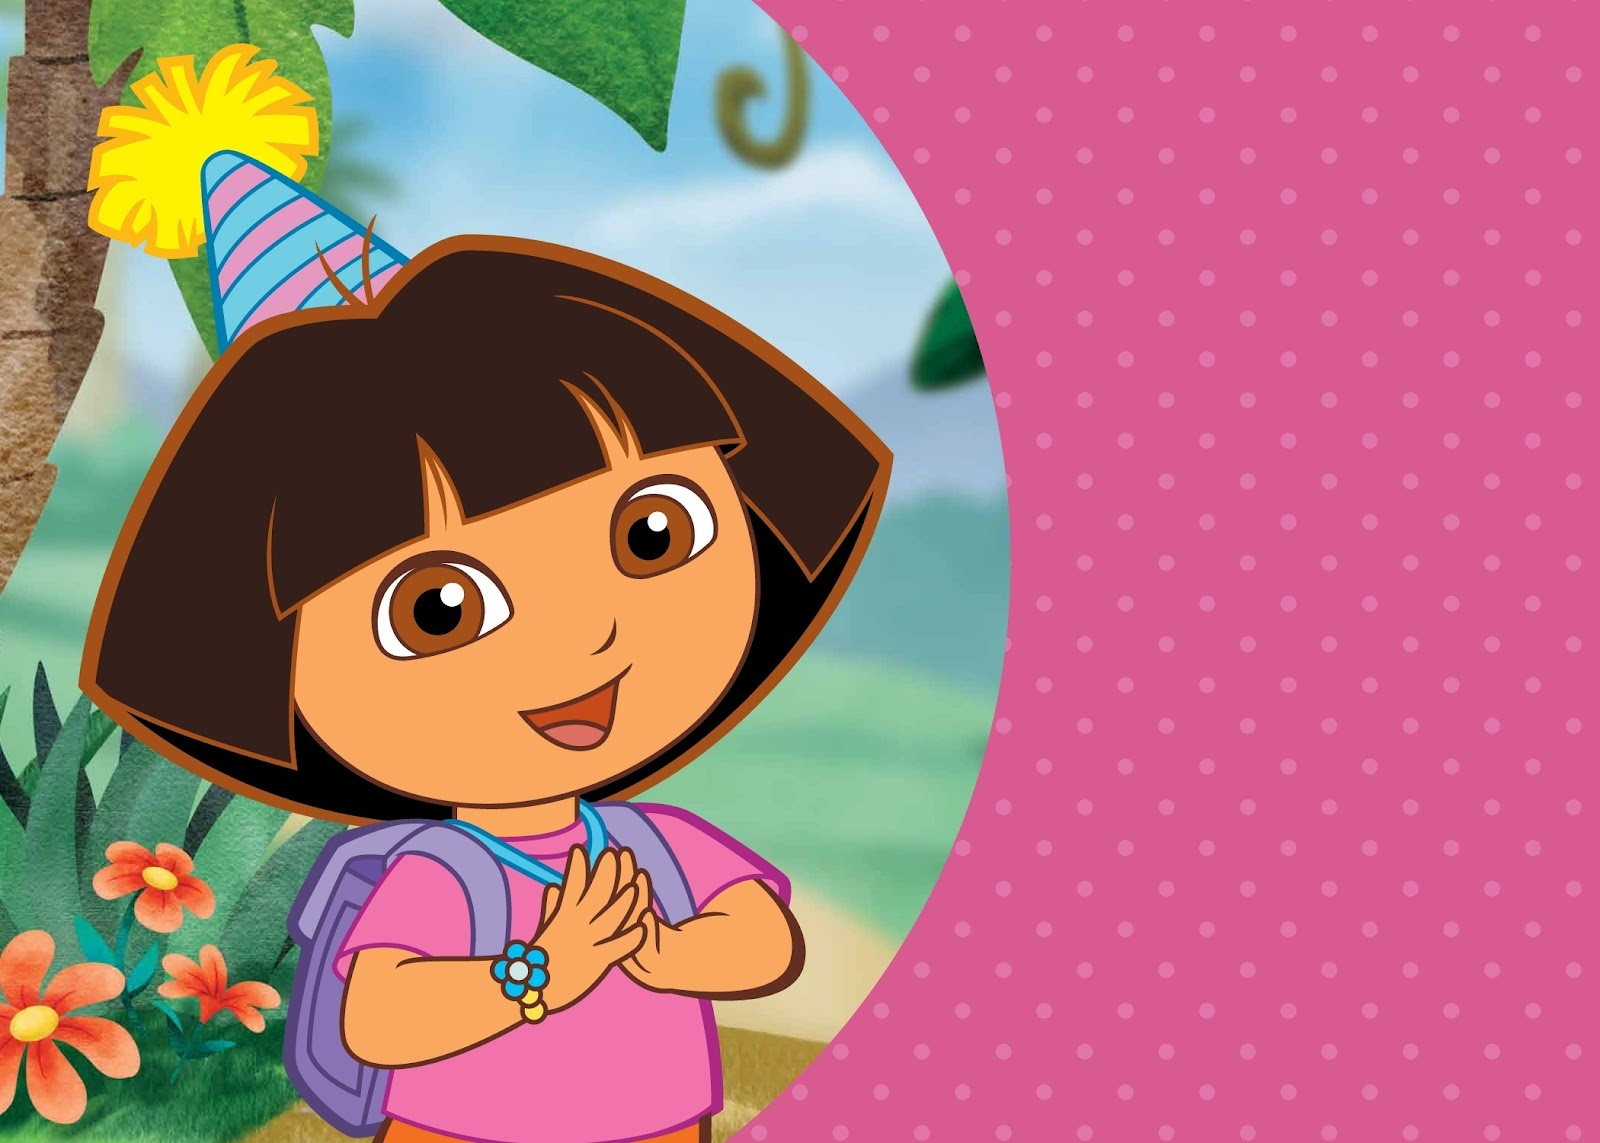 Free Printable Dora The Explorer Invitations - Dora The Explorer Free Printable Invitations